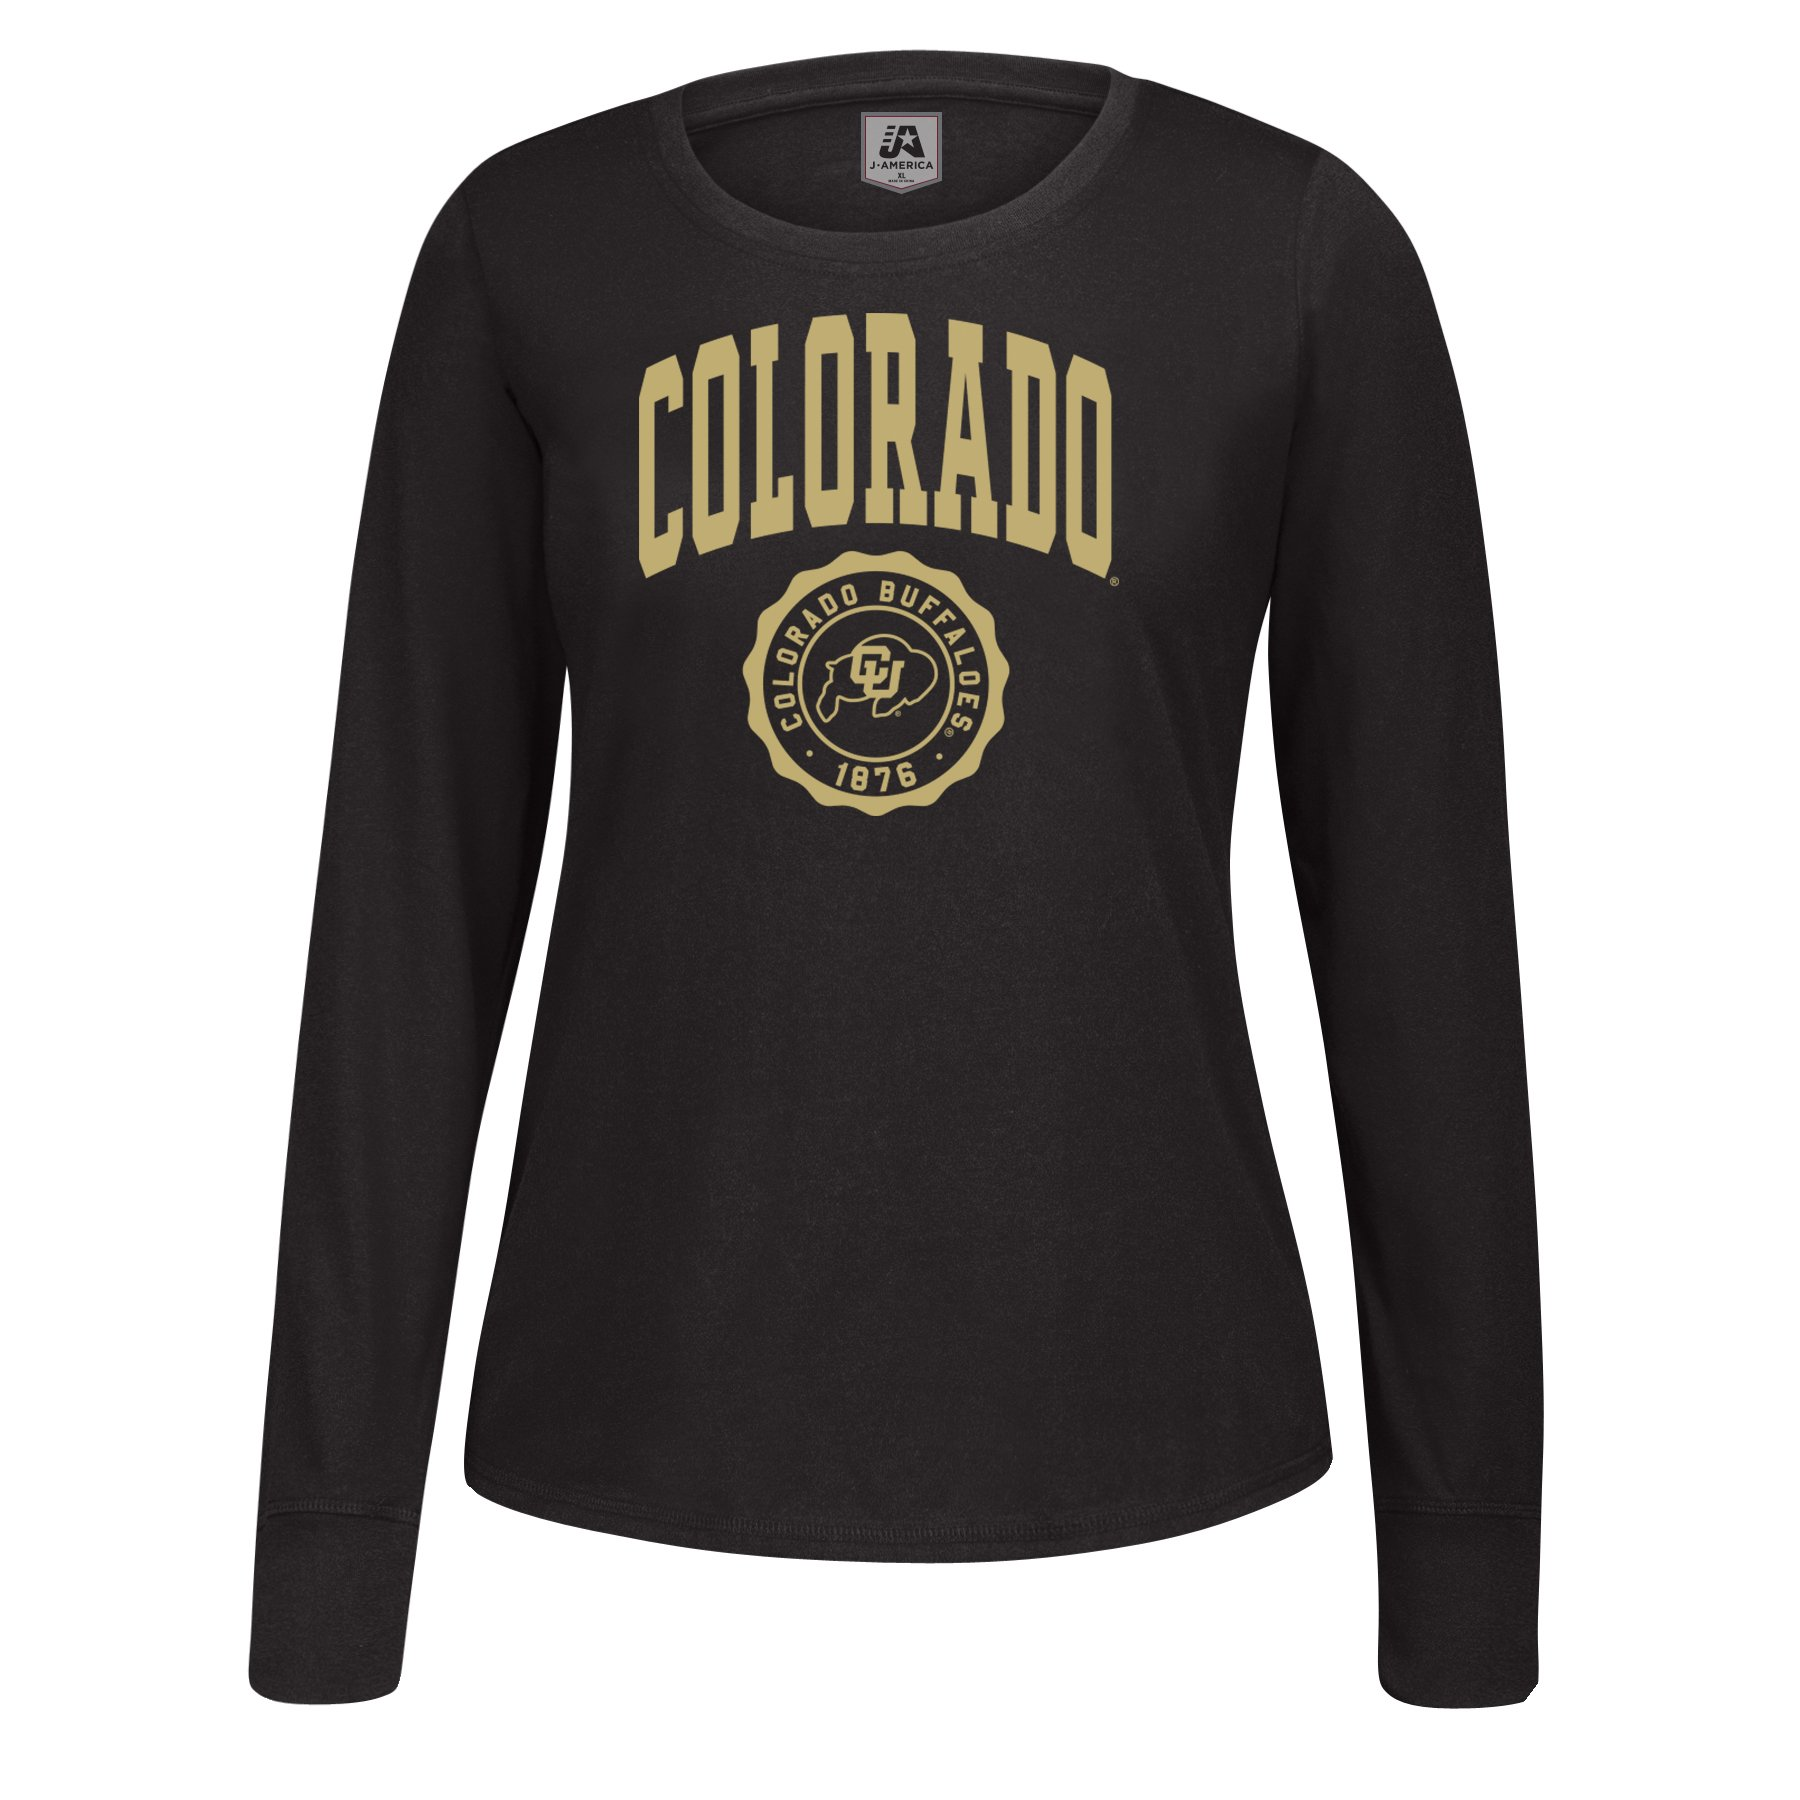 J America NCAA Colorado Buffaloes Women's Athletic Seal Long Sleeve Essential Tee, Small, Black